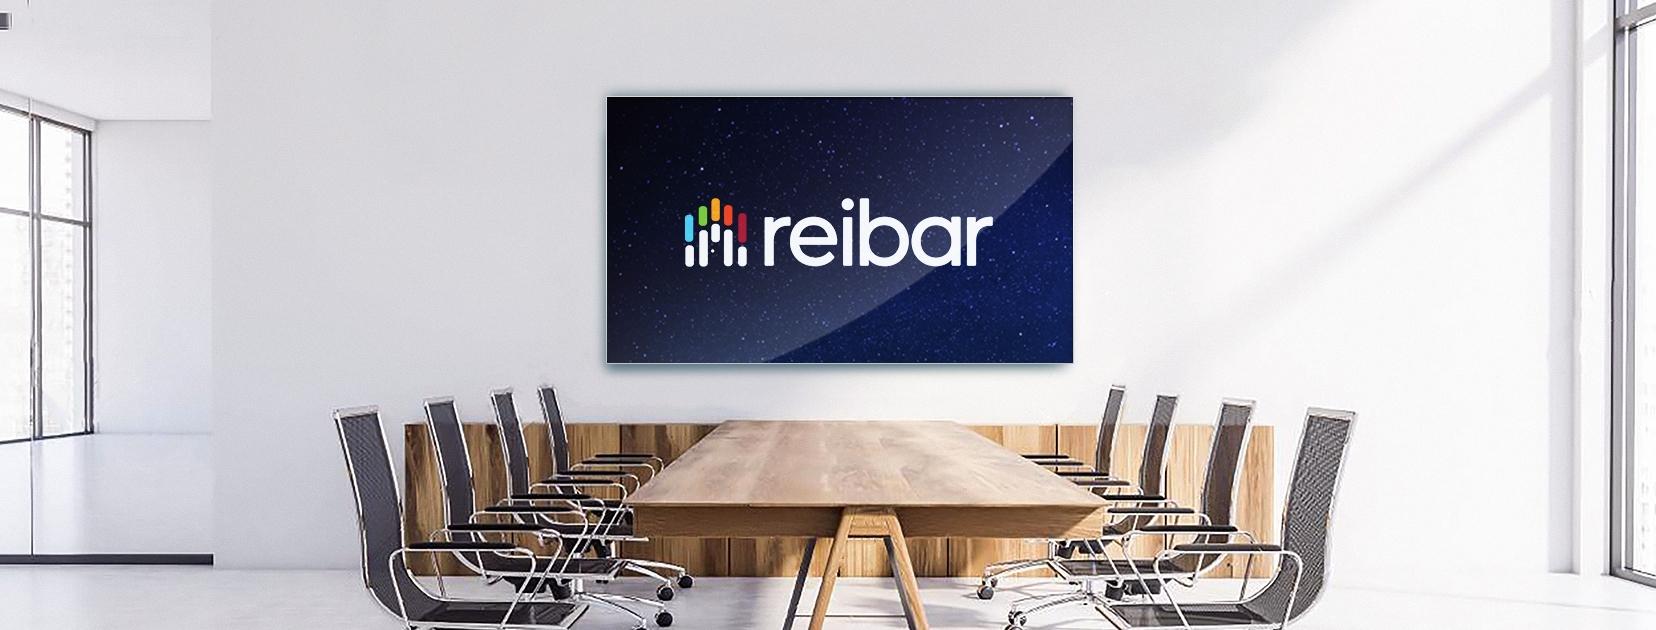 Reibar Marketing (@reibar) Cover Image